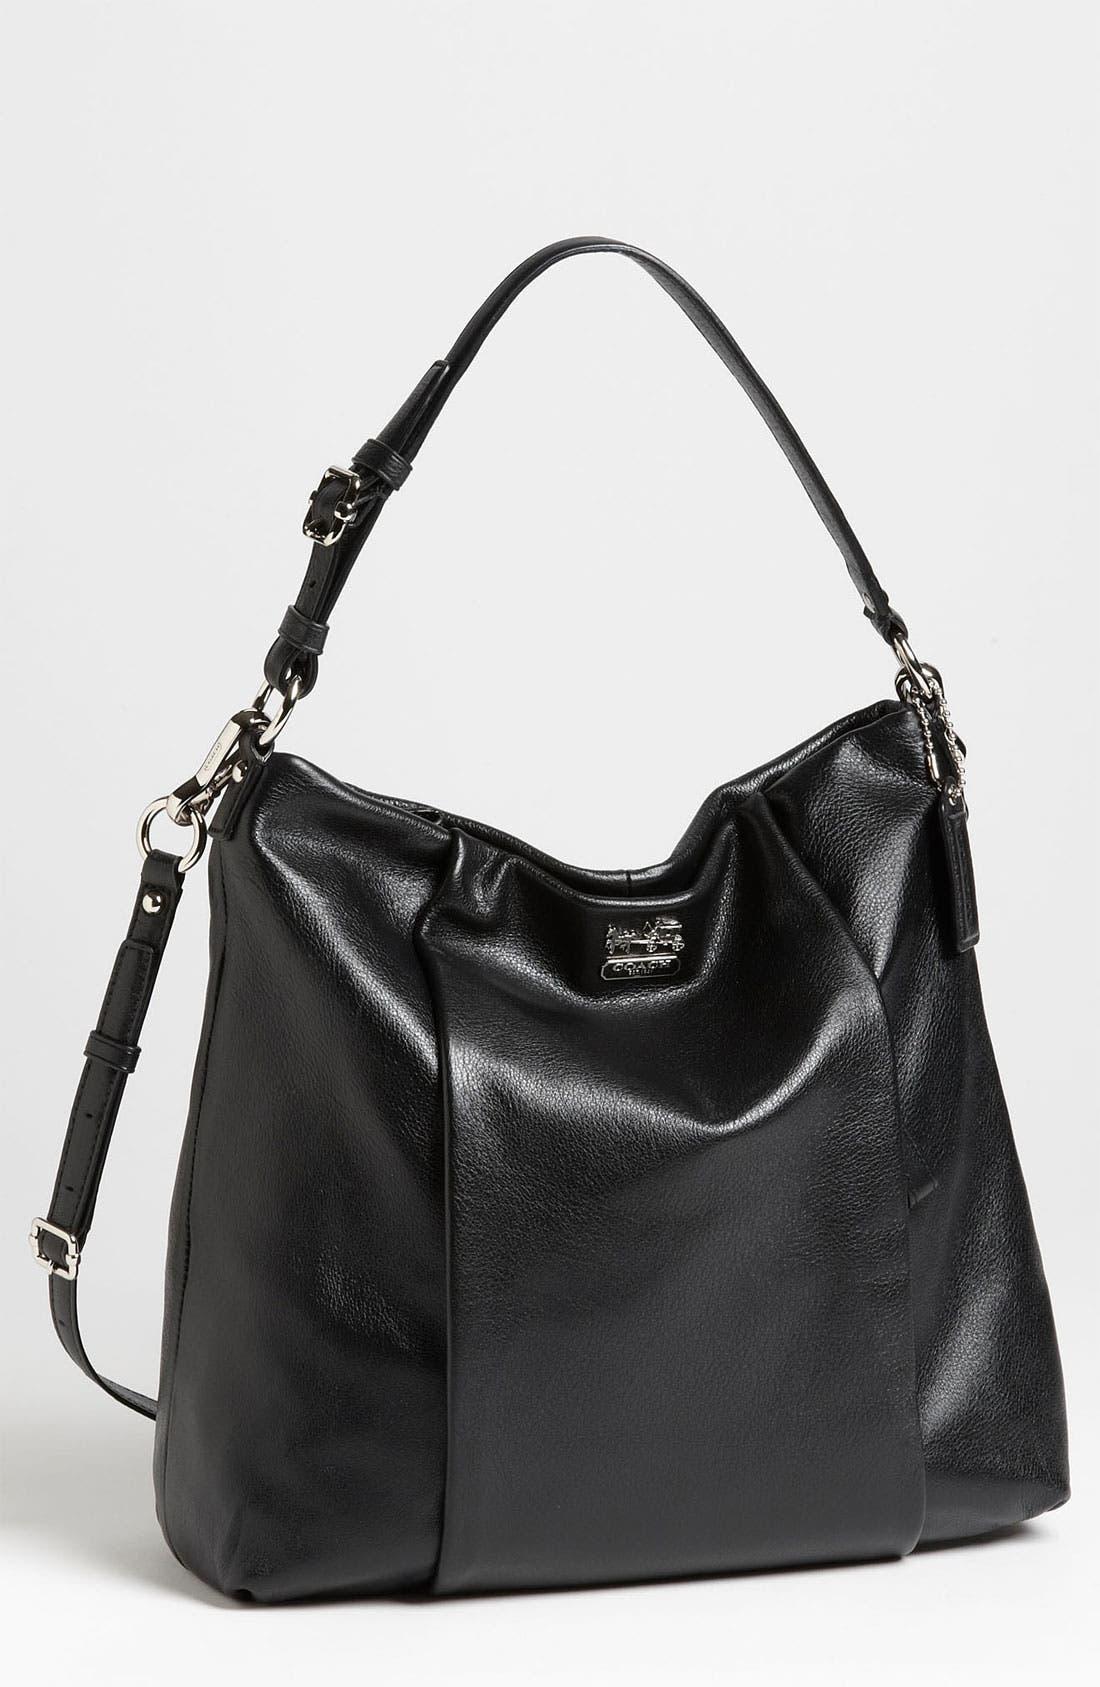 COACH 'New Madison - Isabelle' Leather Shoulder Bag, Main, color, 001